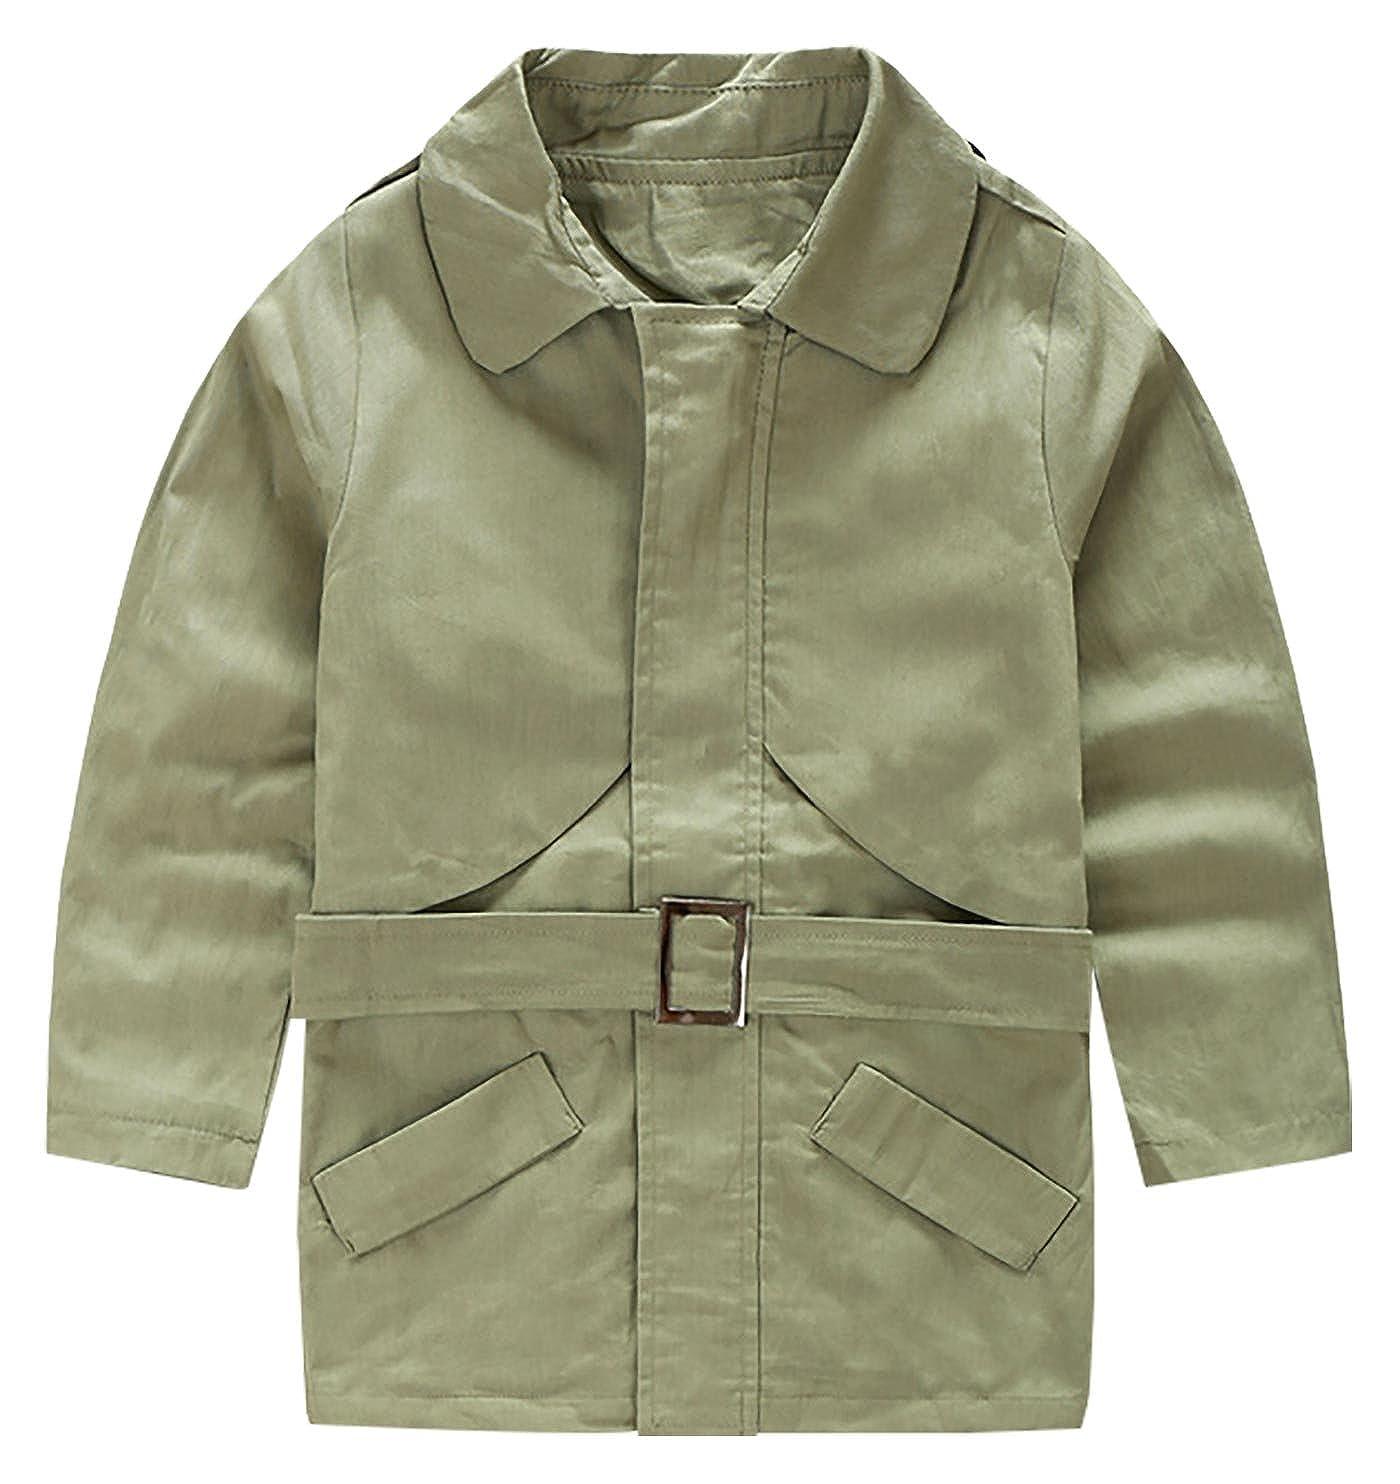 309e2b6646de Amazon.com  Aivtalk Boys Trench Coat with Belt Winter Hand Pockets ...